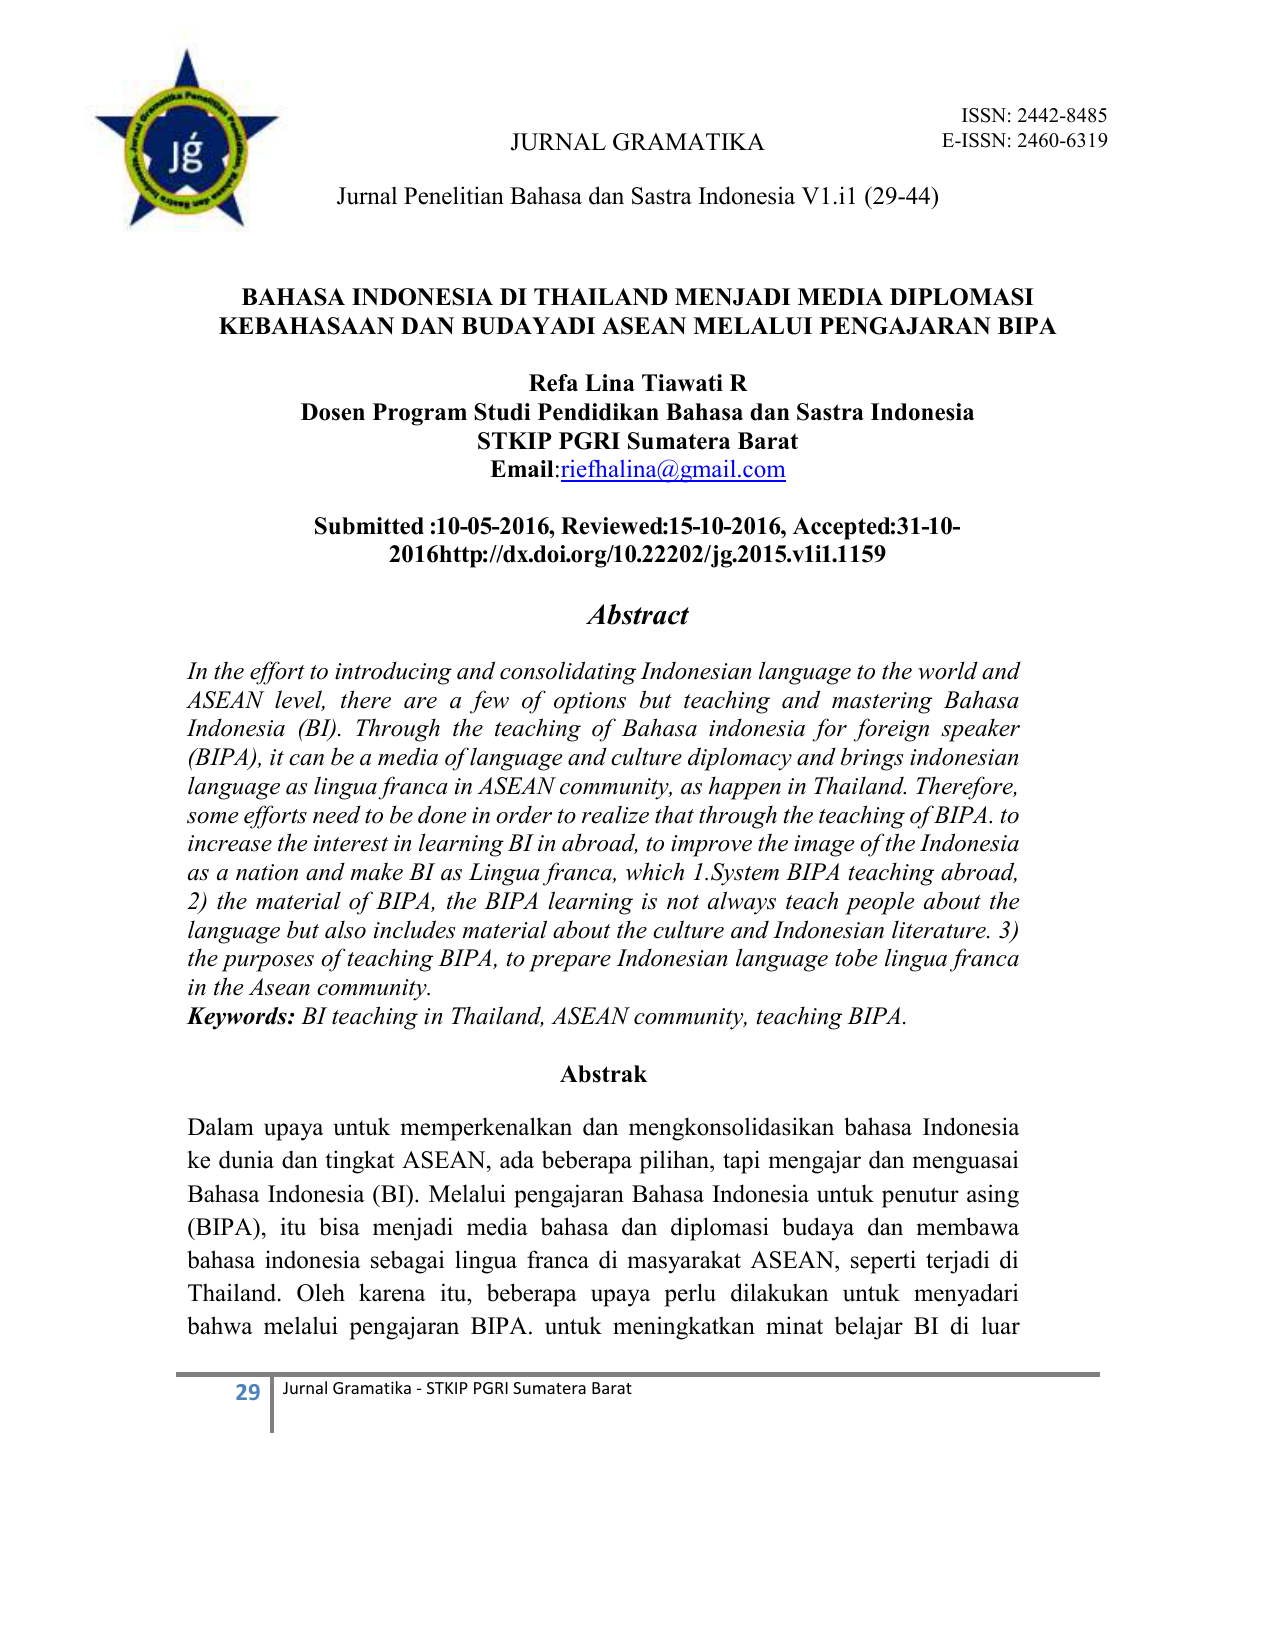 JURNAL GRAMATIKA ISSN 2442 8485 E ISSN 2460 6319 Jurnal Penelitian Bahasa dan Sastra Indonesia V1 i1 29 44 BAHASA INDONESIA DI THAILAND MENJADI MEDIA